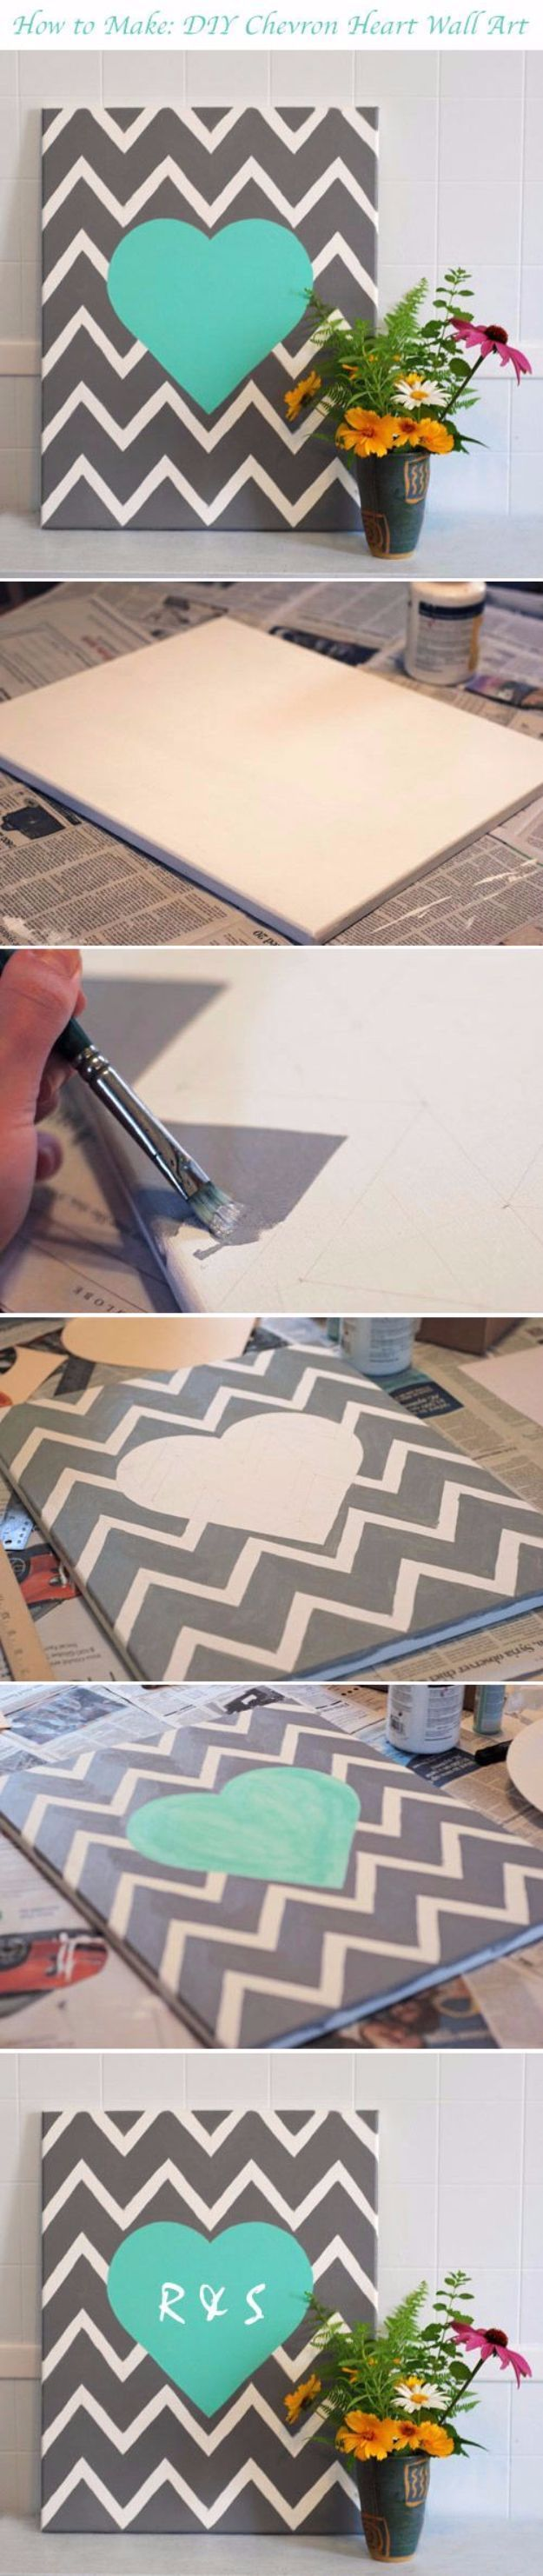 diy canvas painting ideas bedroomapartmentcollage pinterest